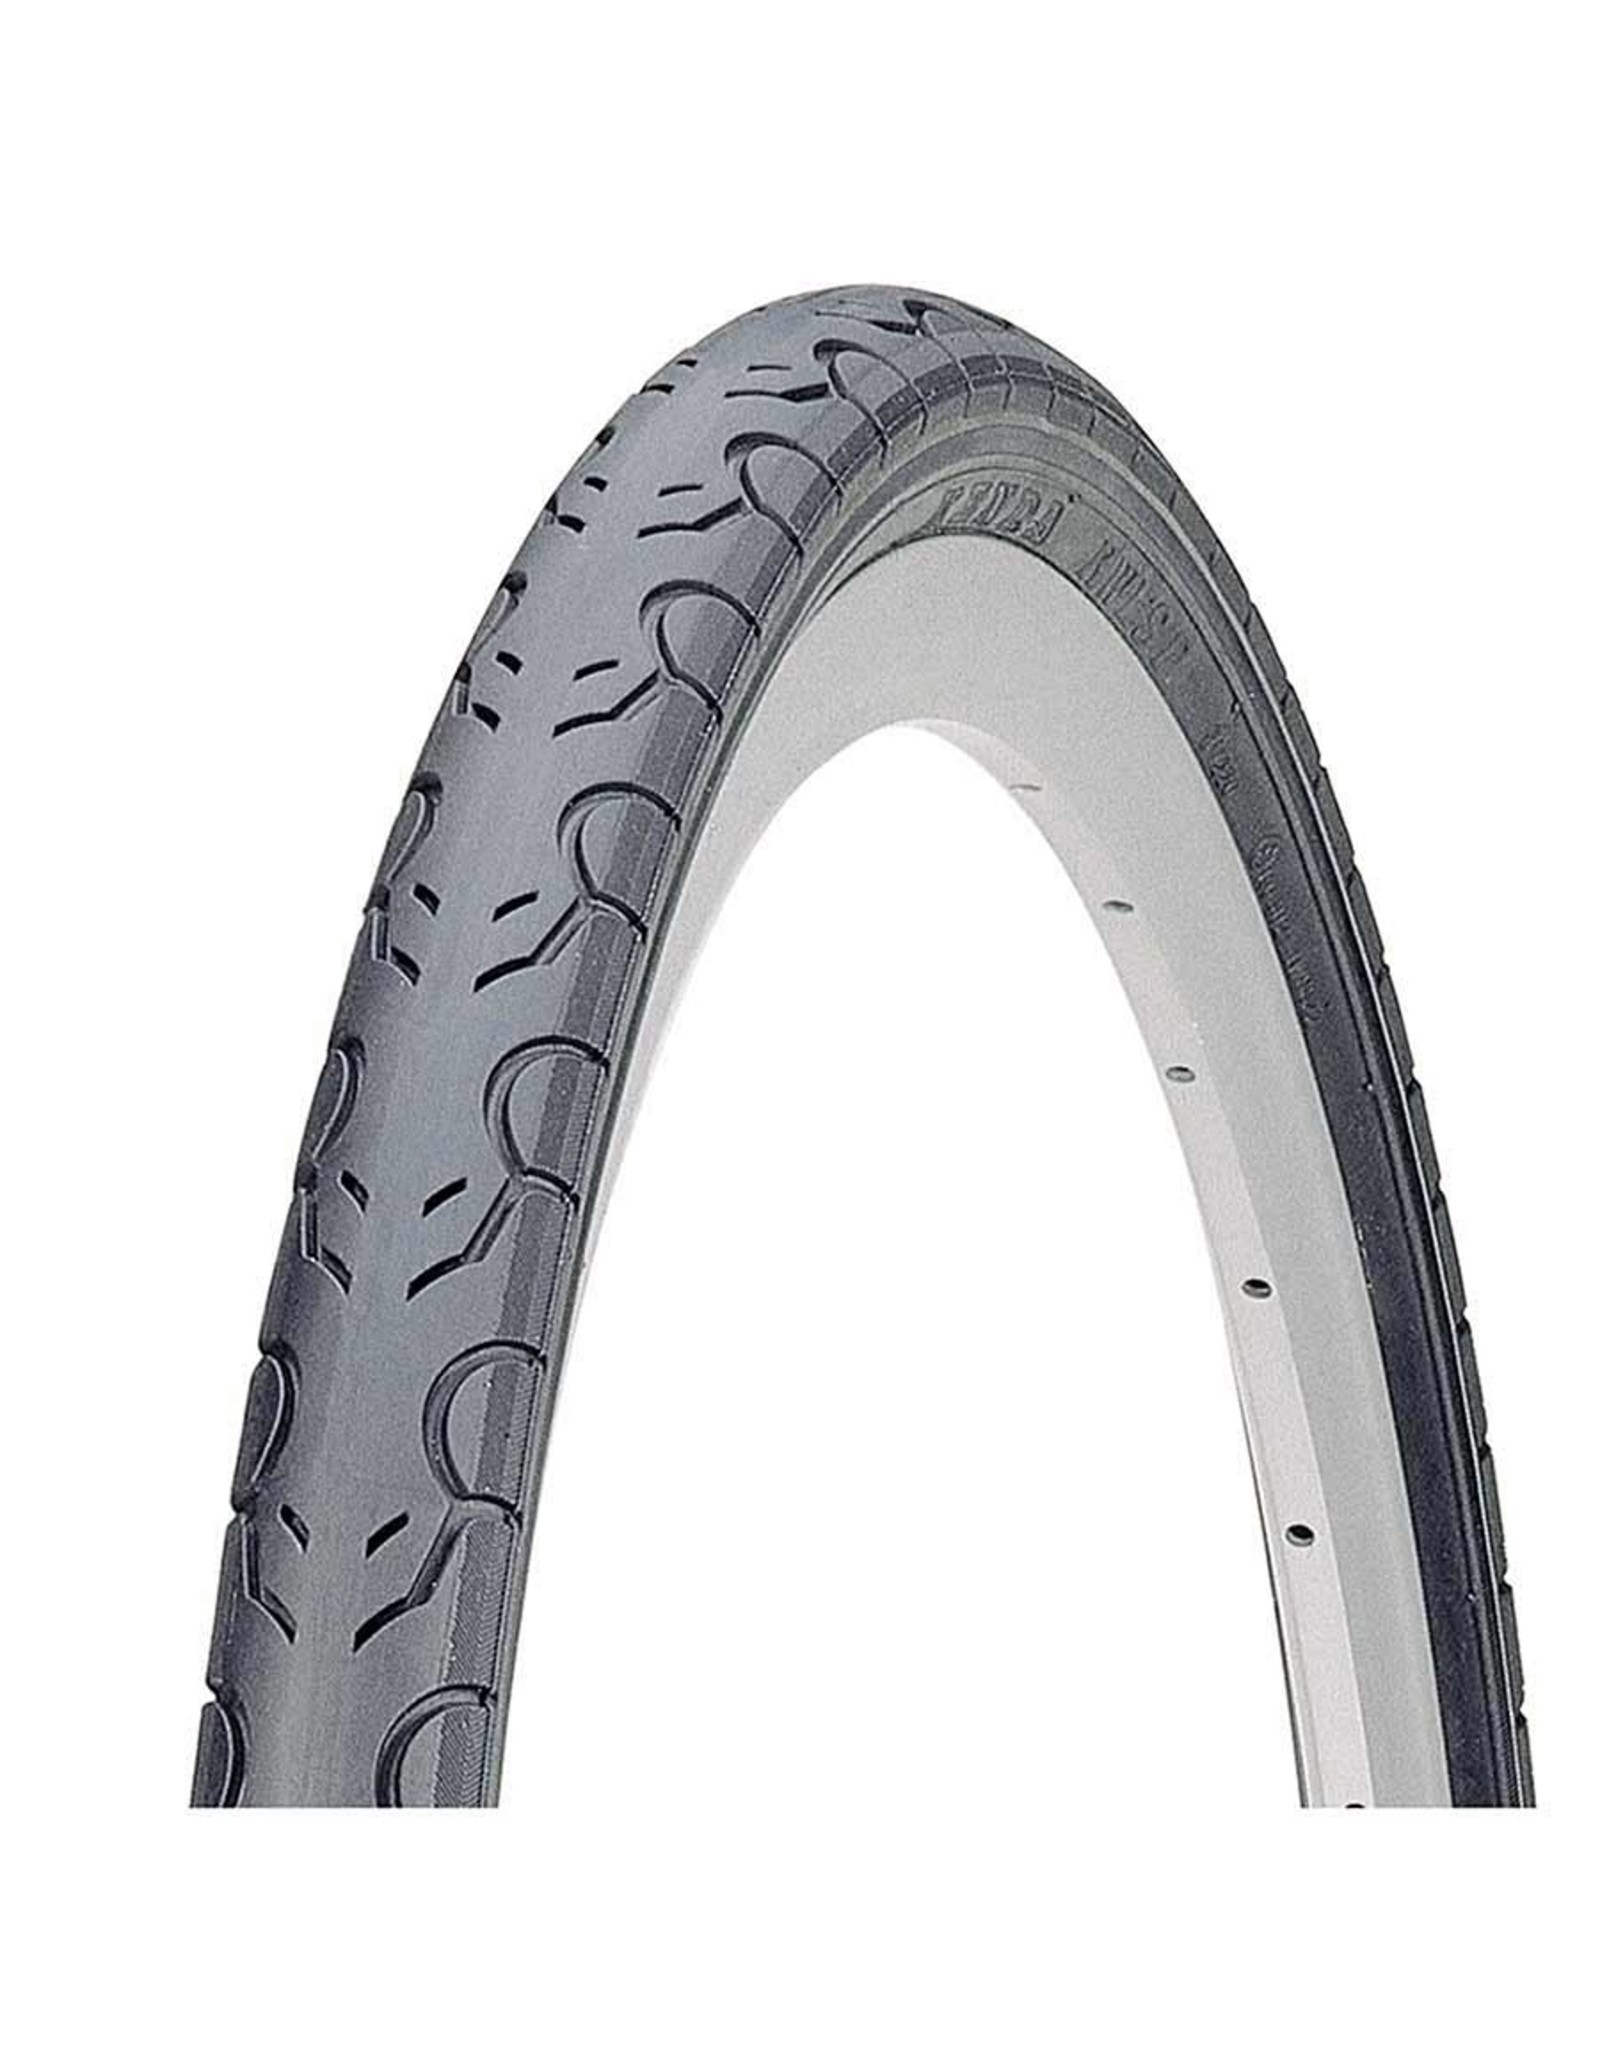 Kenda, Kwest K193, Tire, 16''x1.50, Wire, Clincher, 60TPI, Black